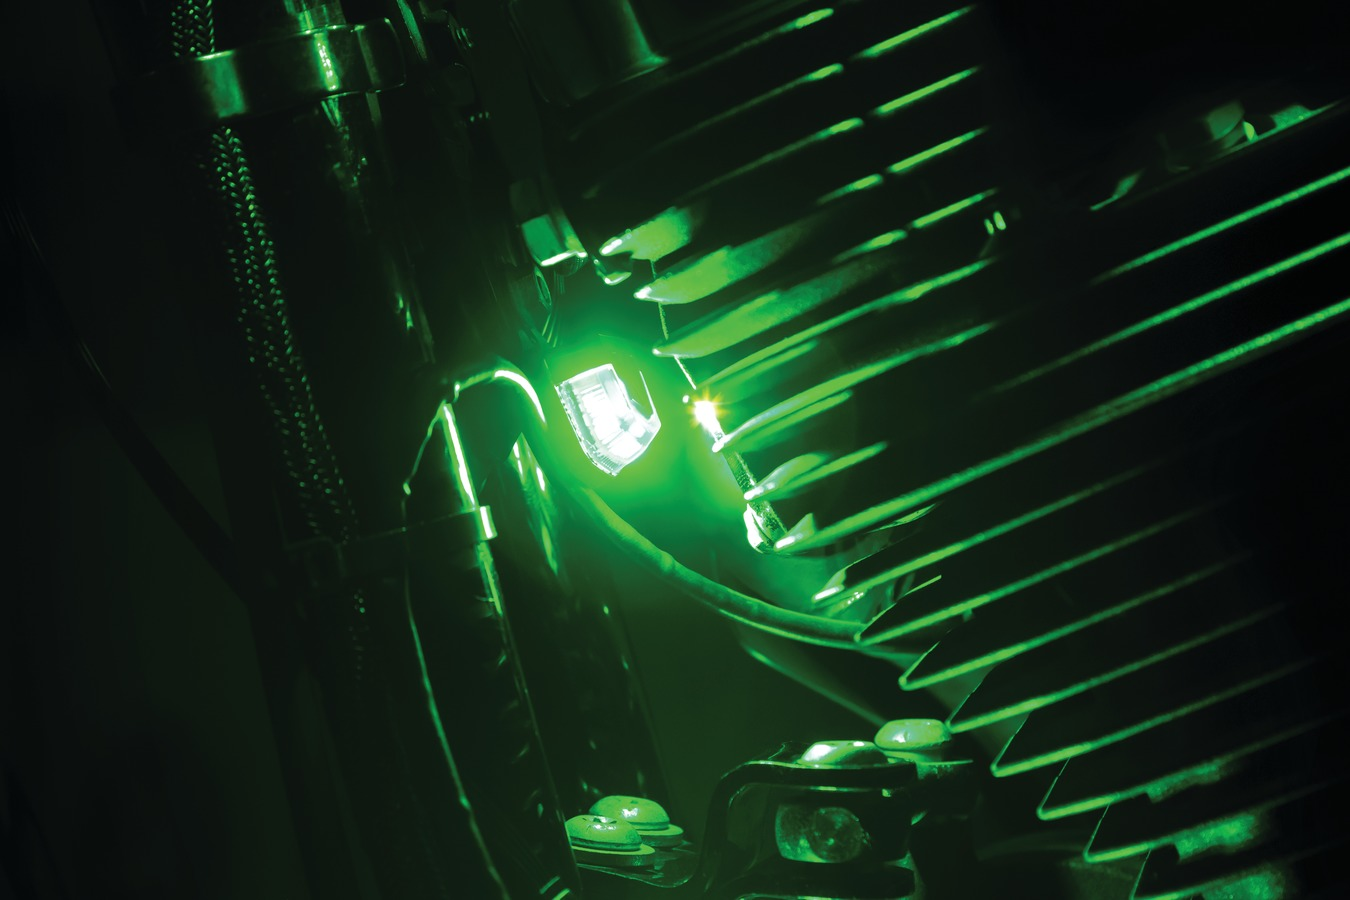 Kuryakyn Introduces Prism+ L.E.D. 'Ecosystem'